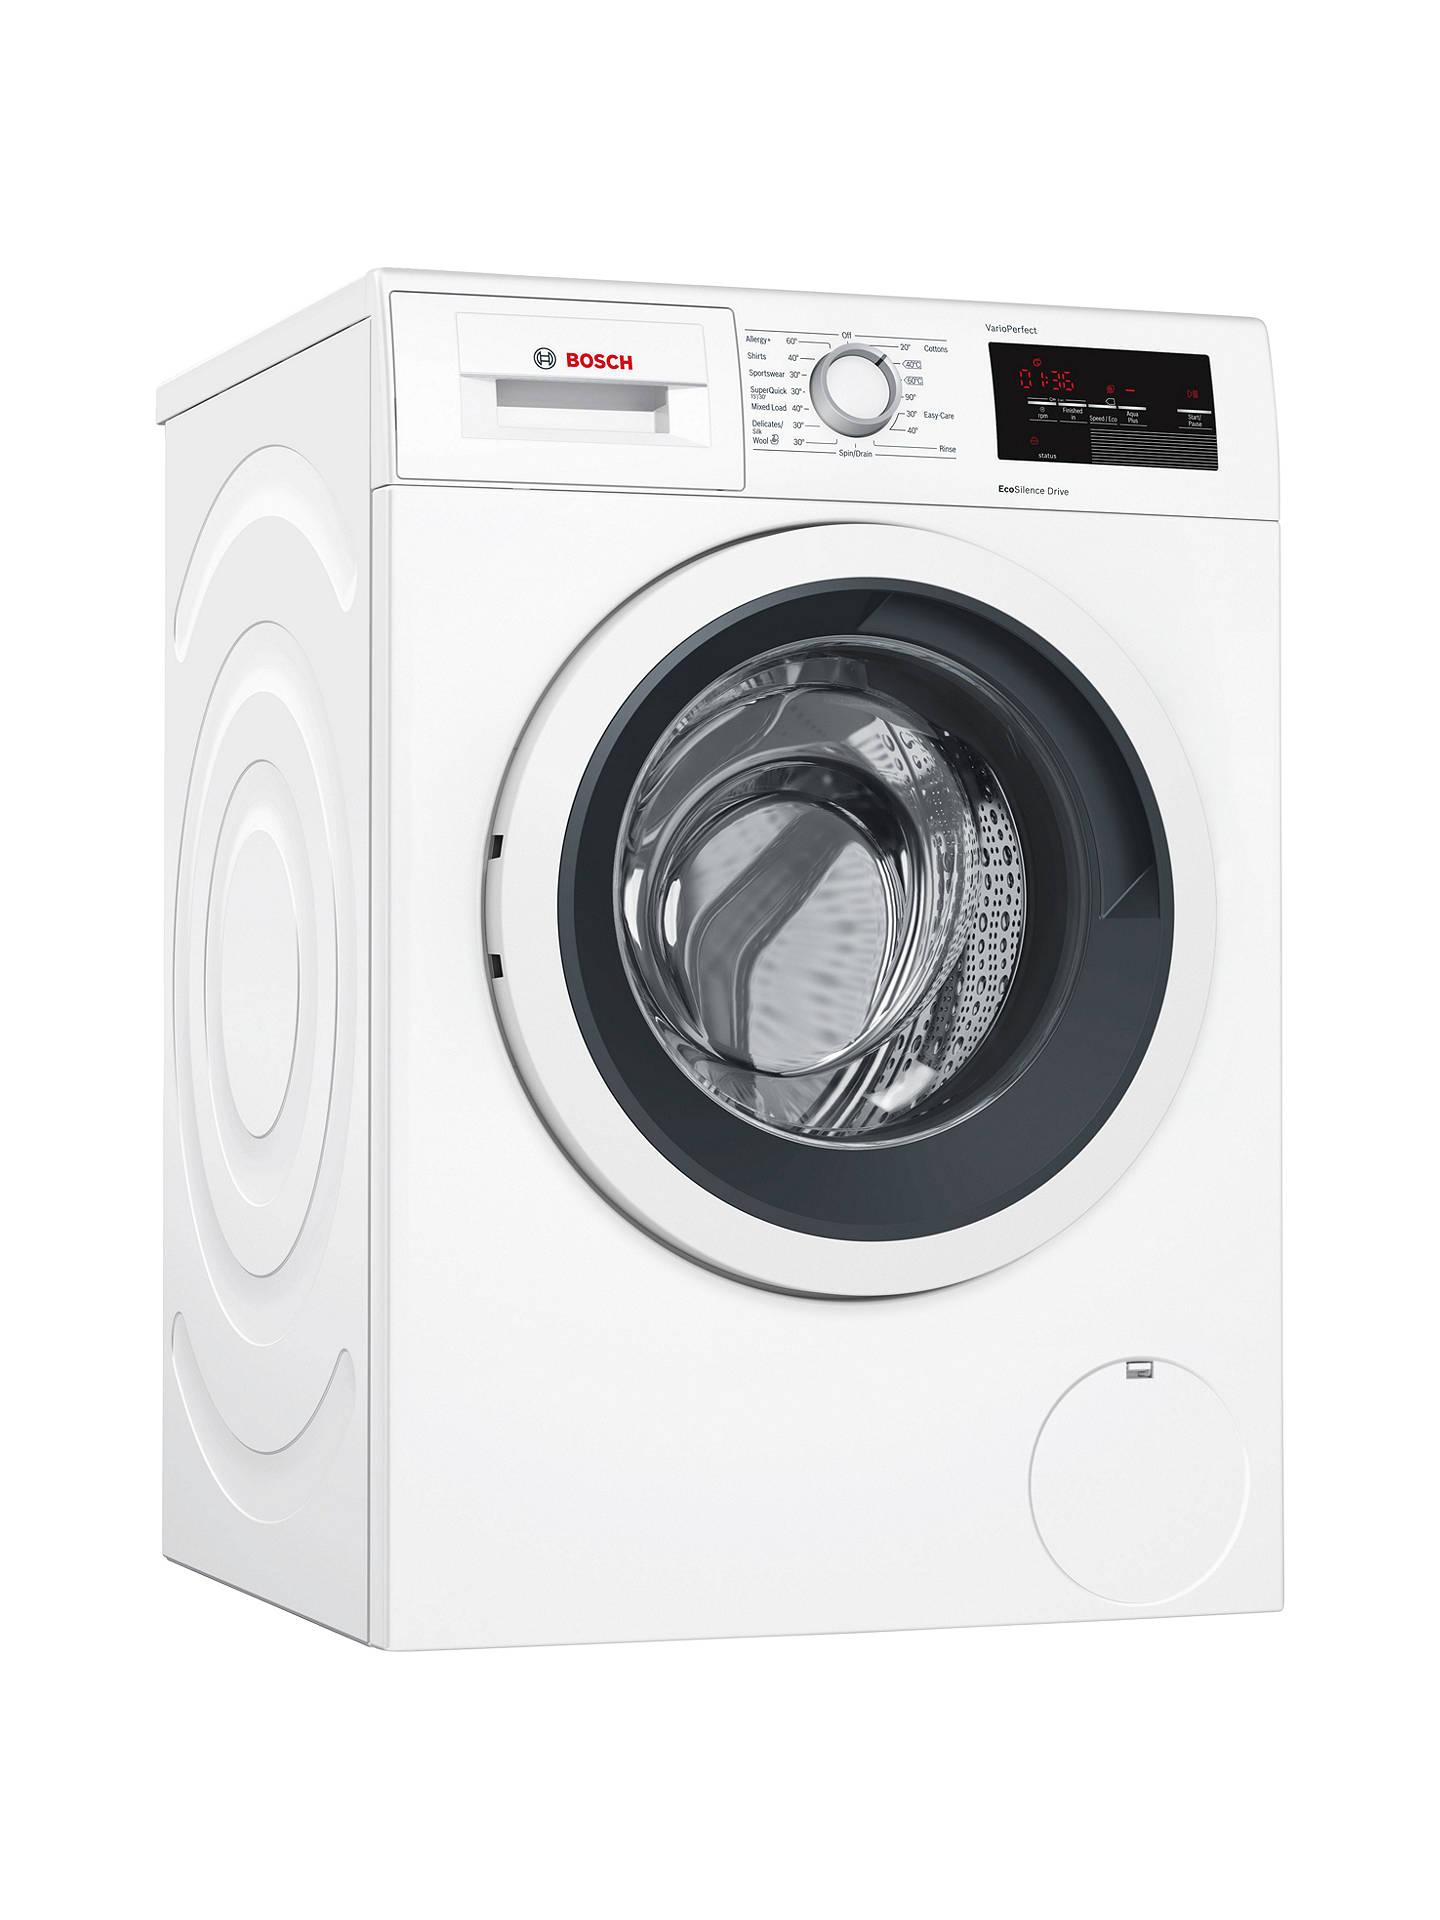 Bosch WAT28371GB Freestanding Washing Machine, 9kg Load, A+++ Energy Rating, 1400rpm Spin, White £399 @ John Lewis